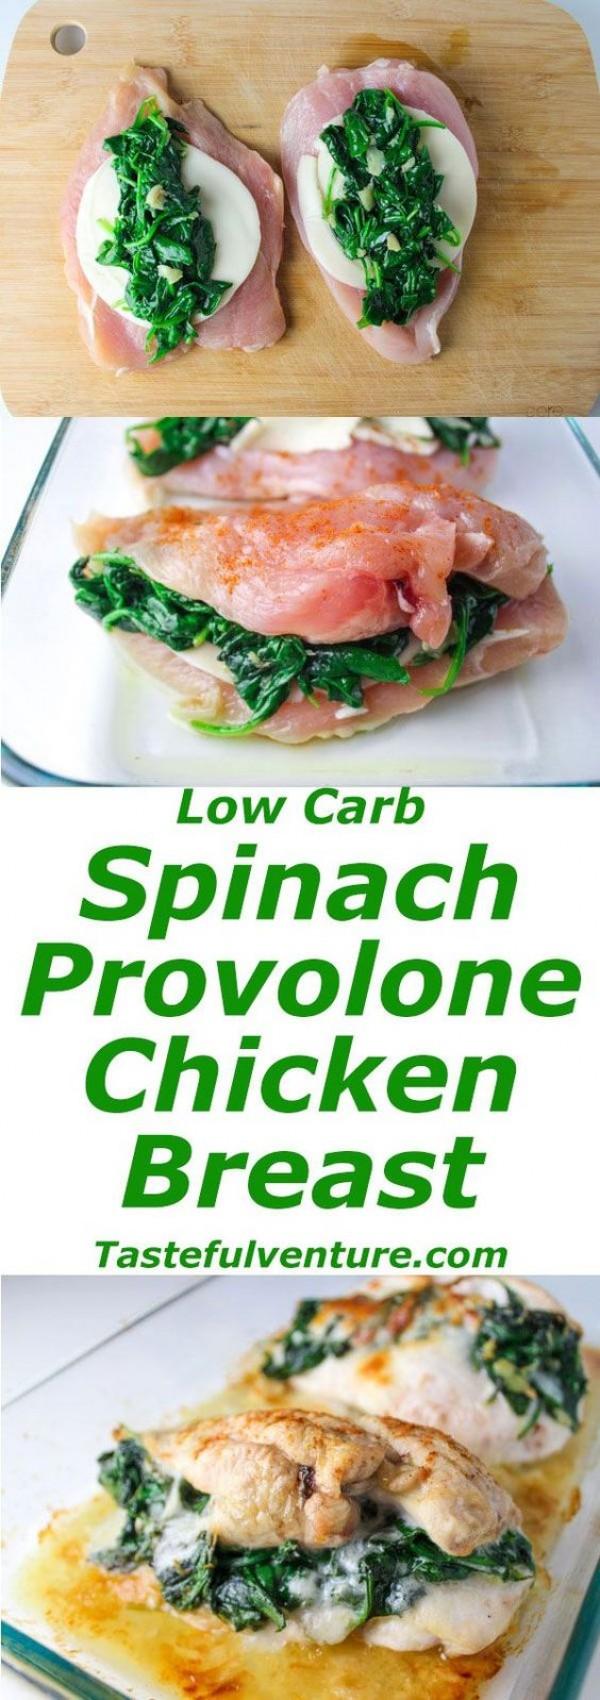 Get the recipe Spinach Provolone Chicken Breast @recipes_to_go